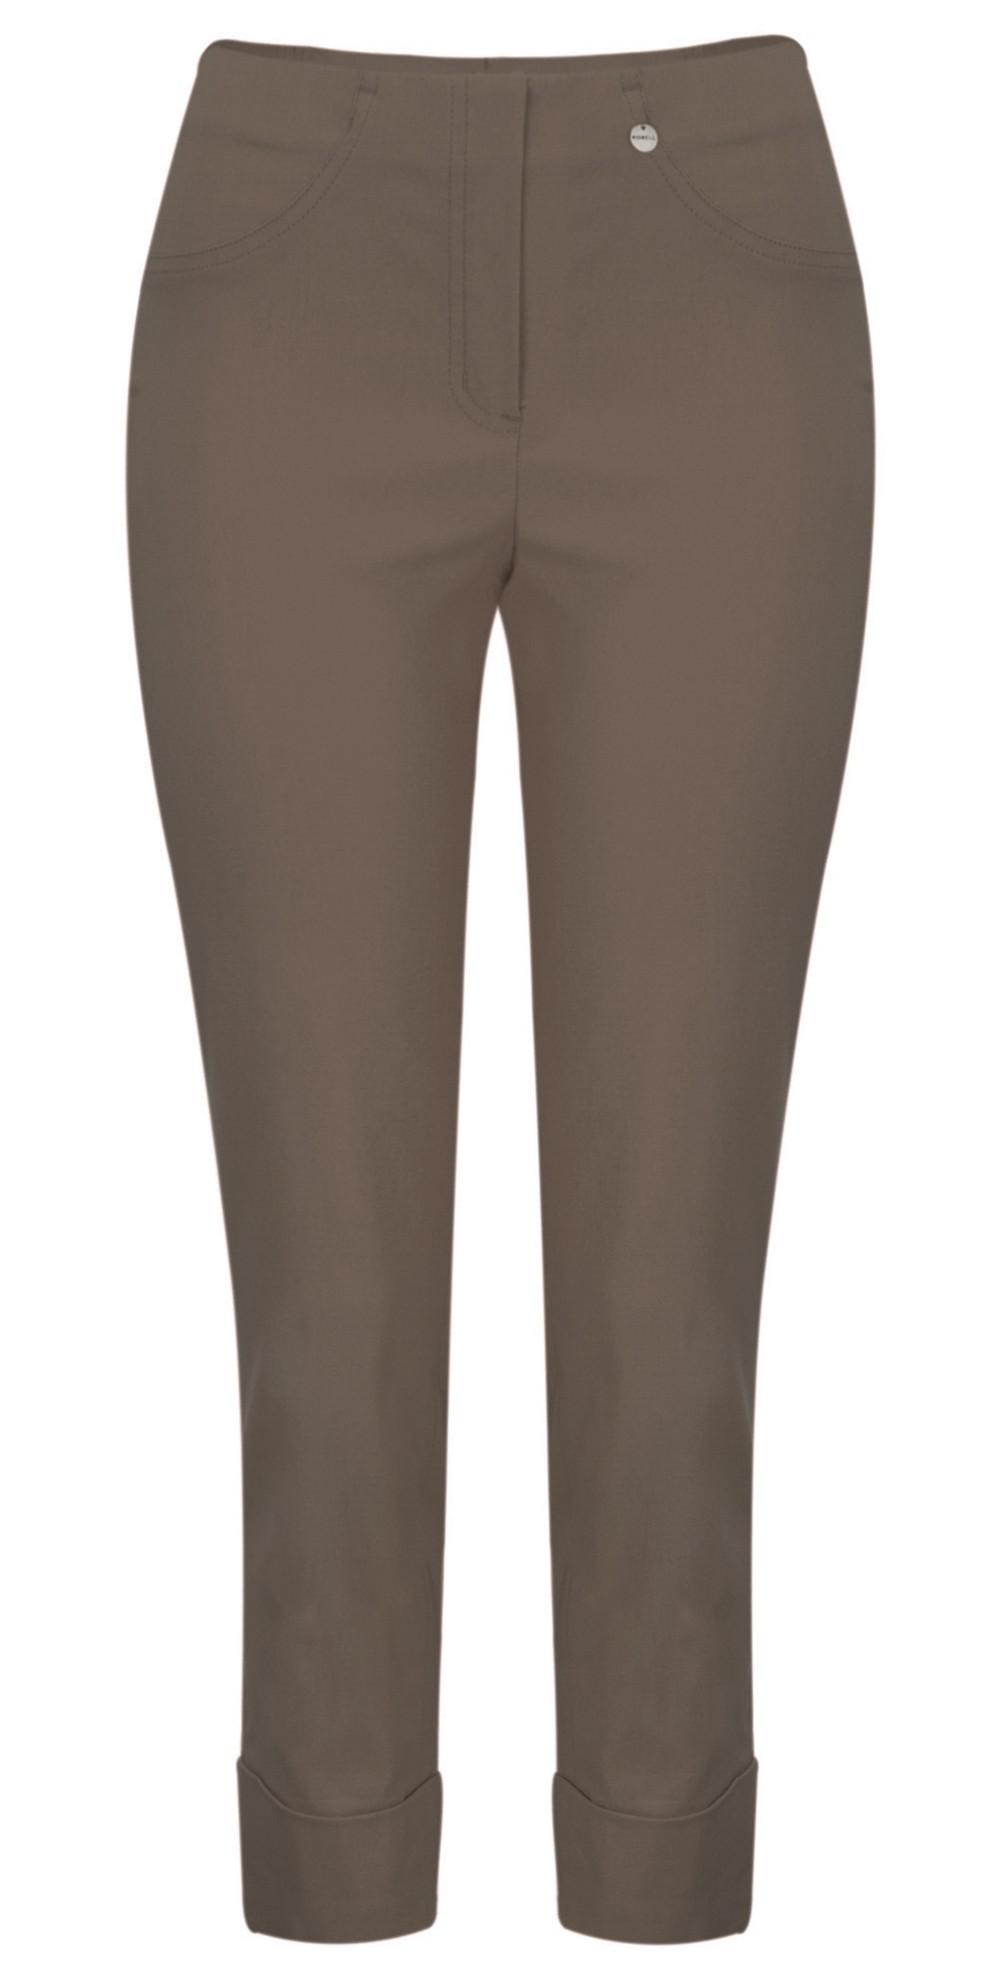 Bella 09 Almond Ankle Length Crop Cuff Trouser main image